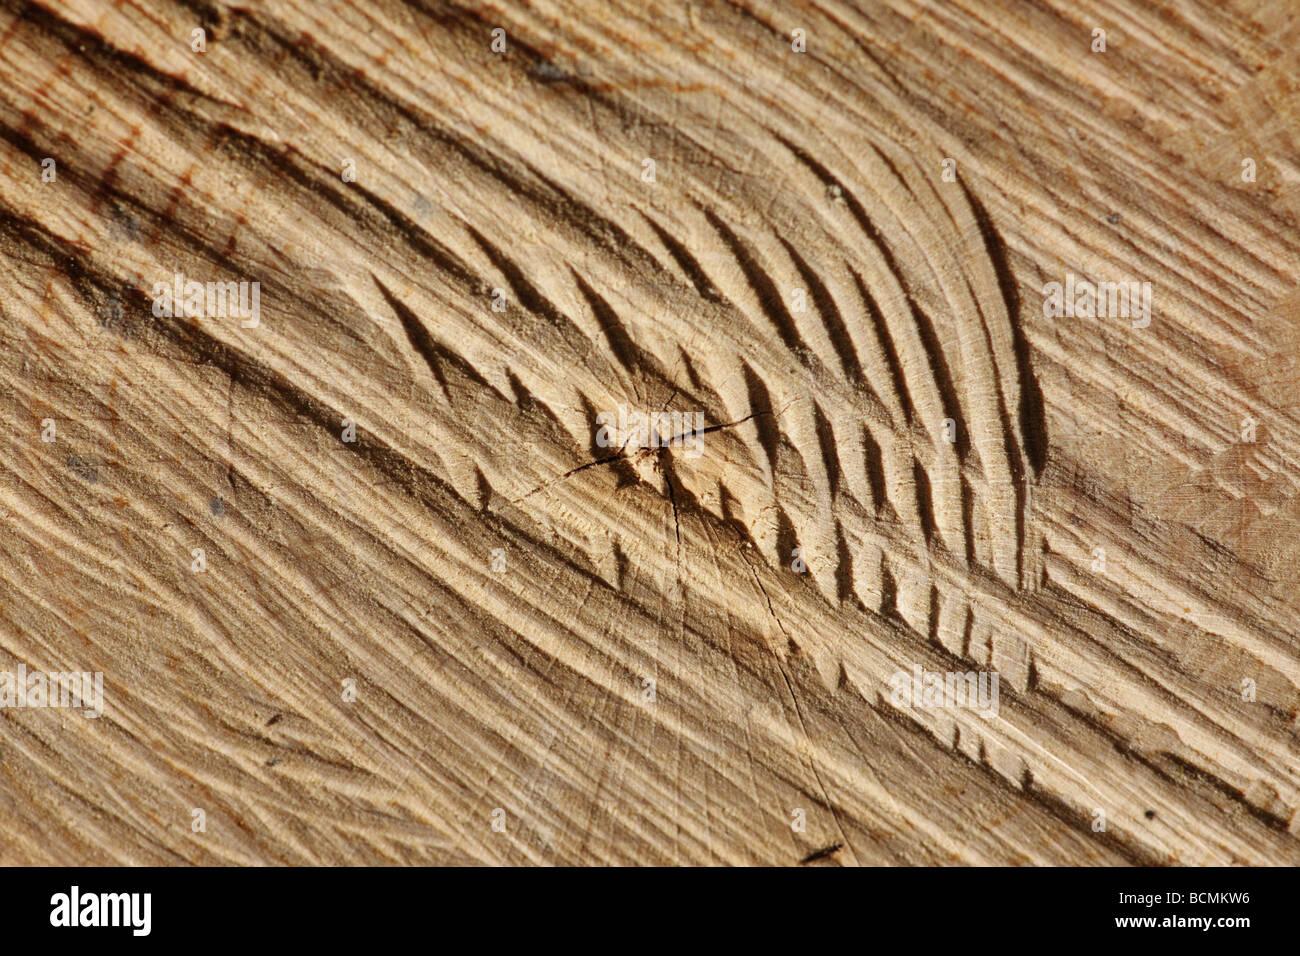 sawed tree - Stock Image